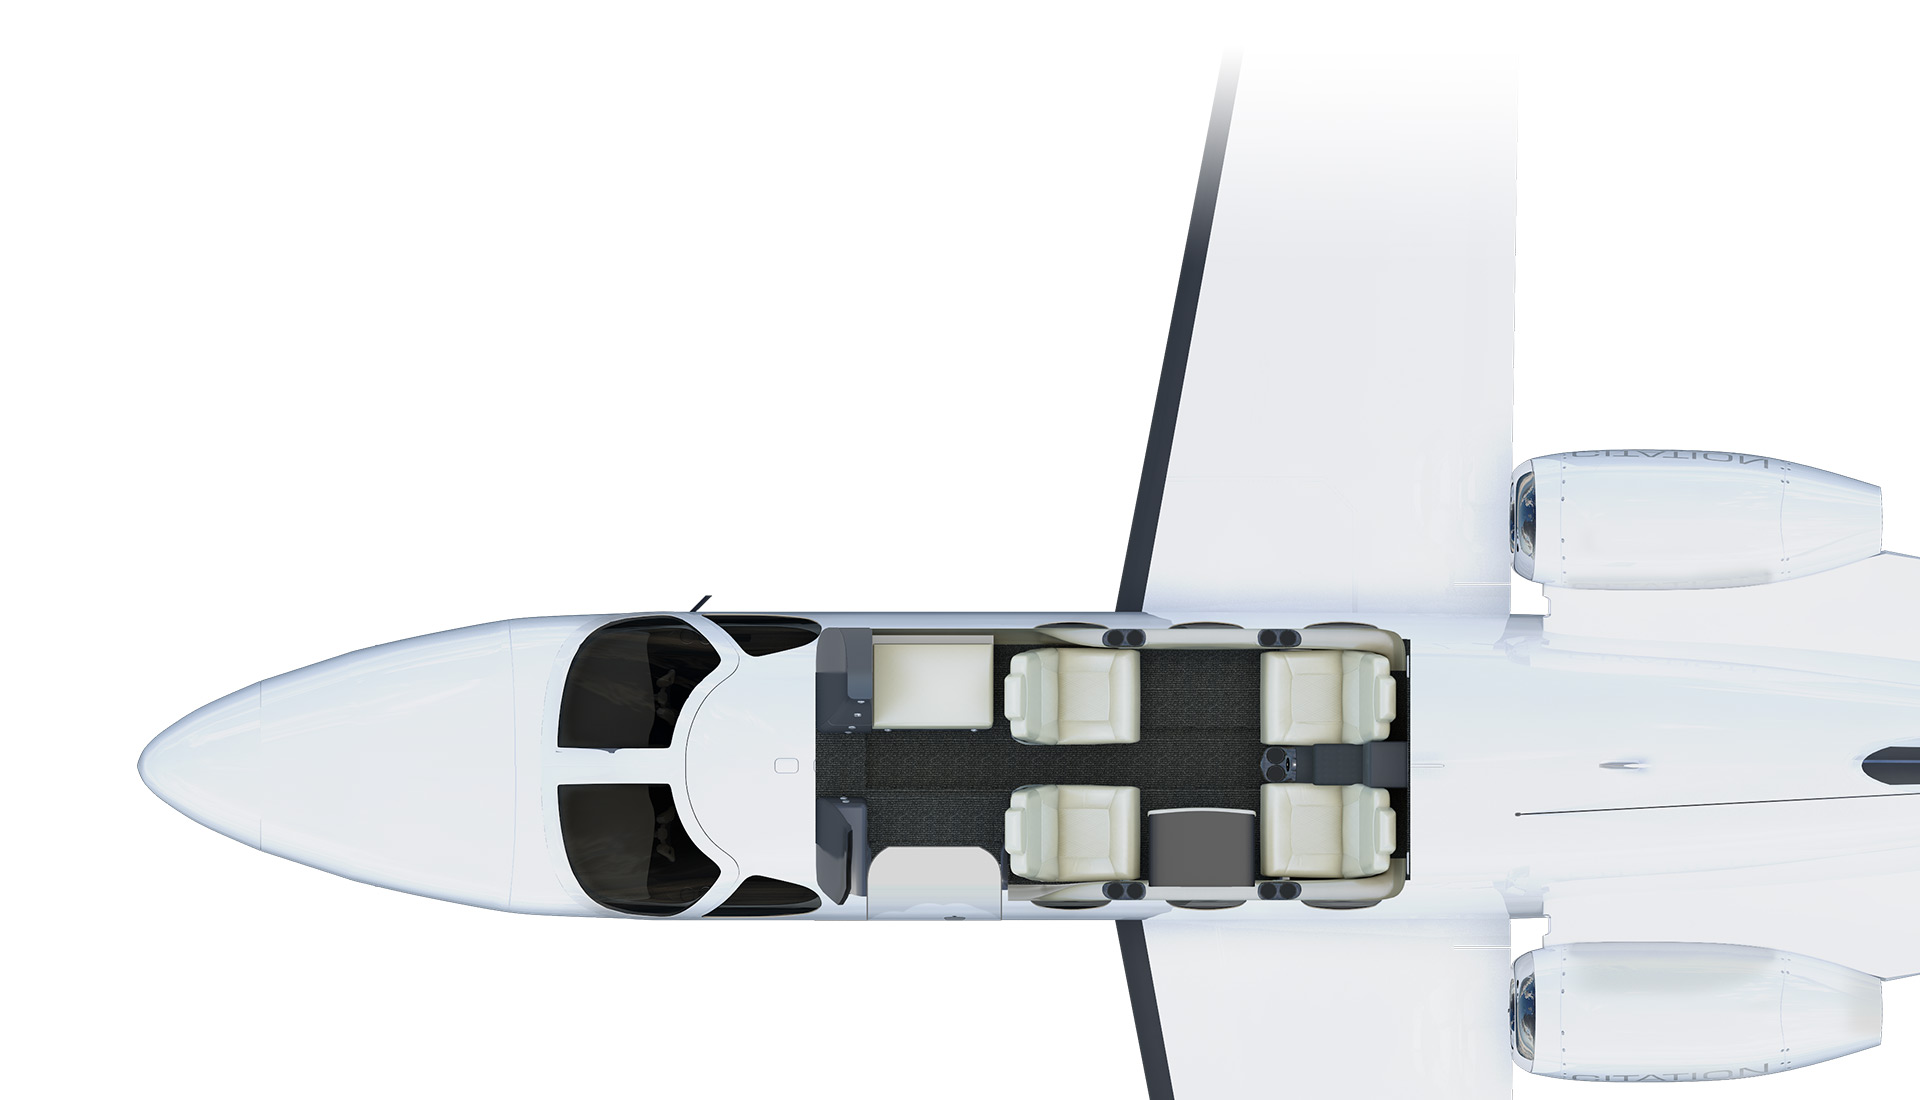 Citation Mustang floorpan